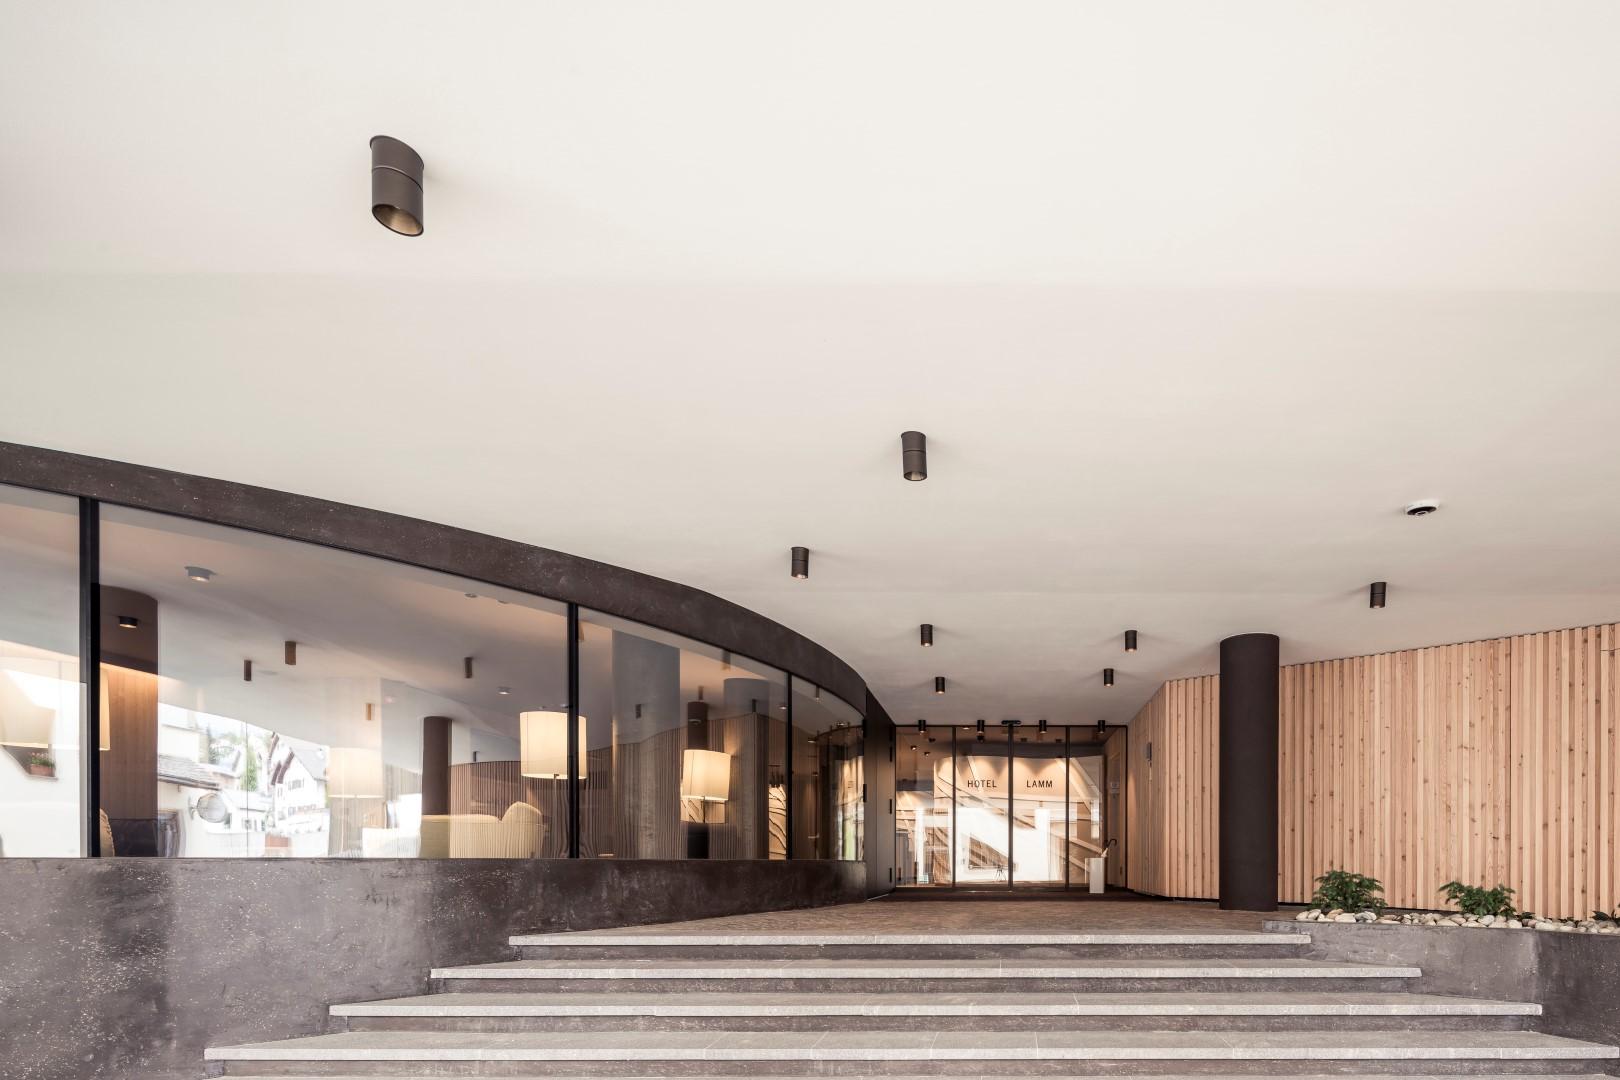 Hotel Lamm Castelrotto Alto Adige